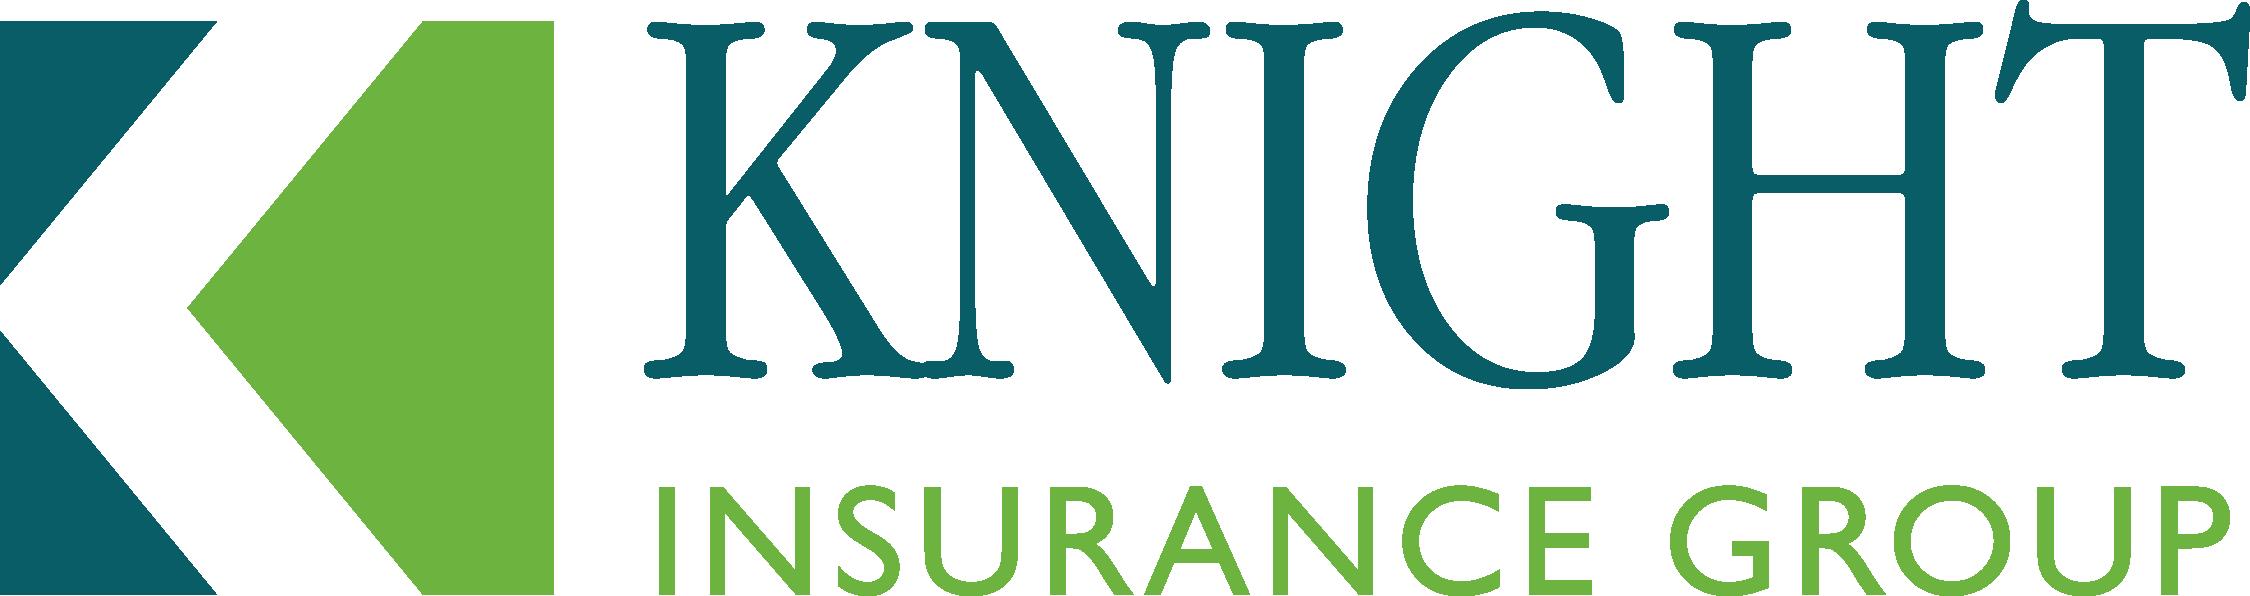 Knight Insurance Group logo